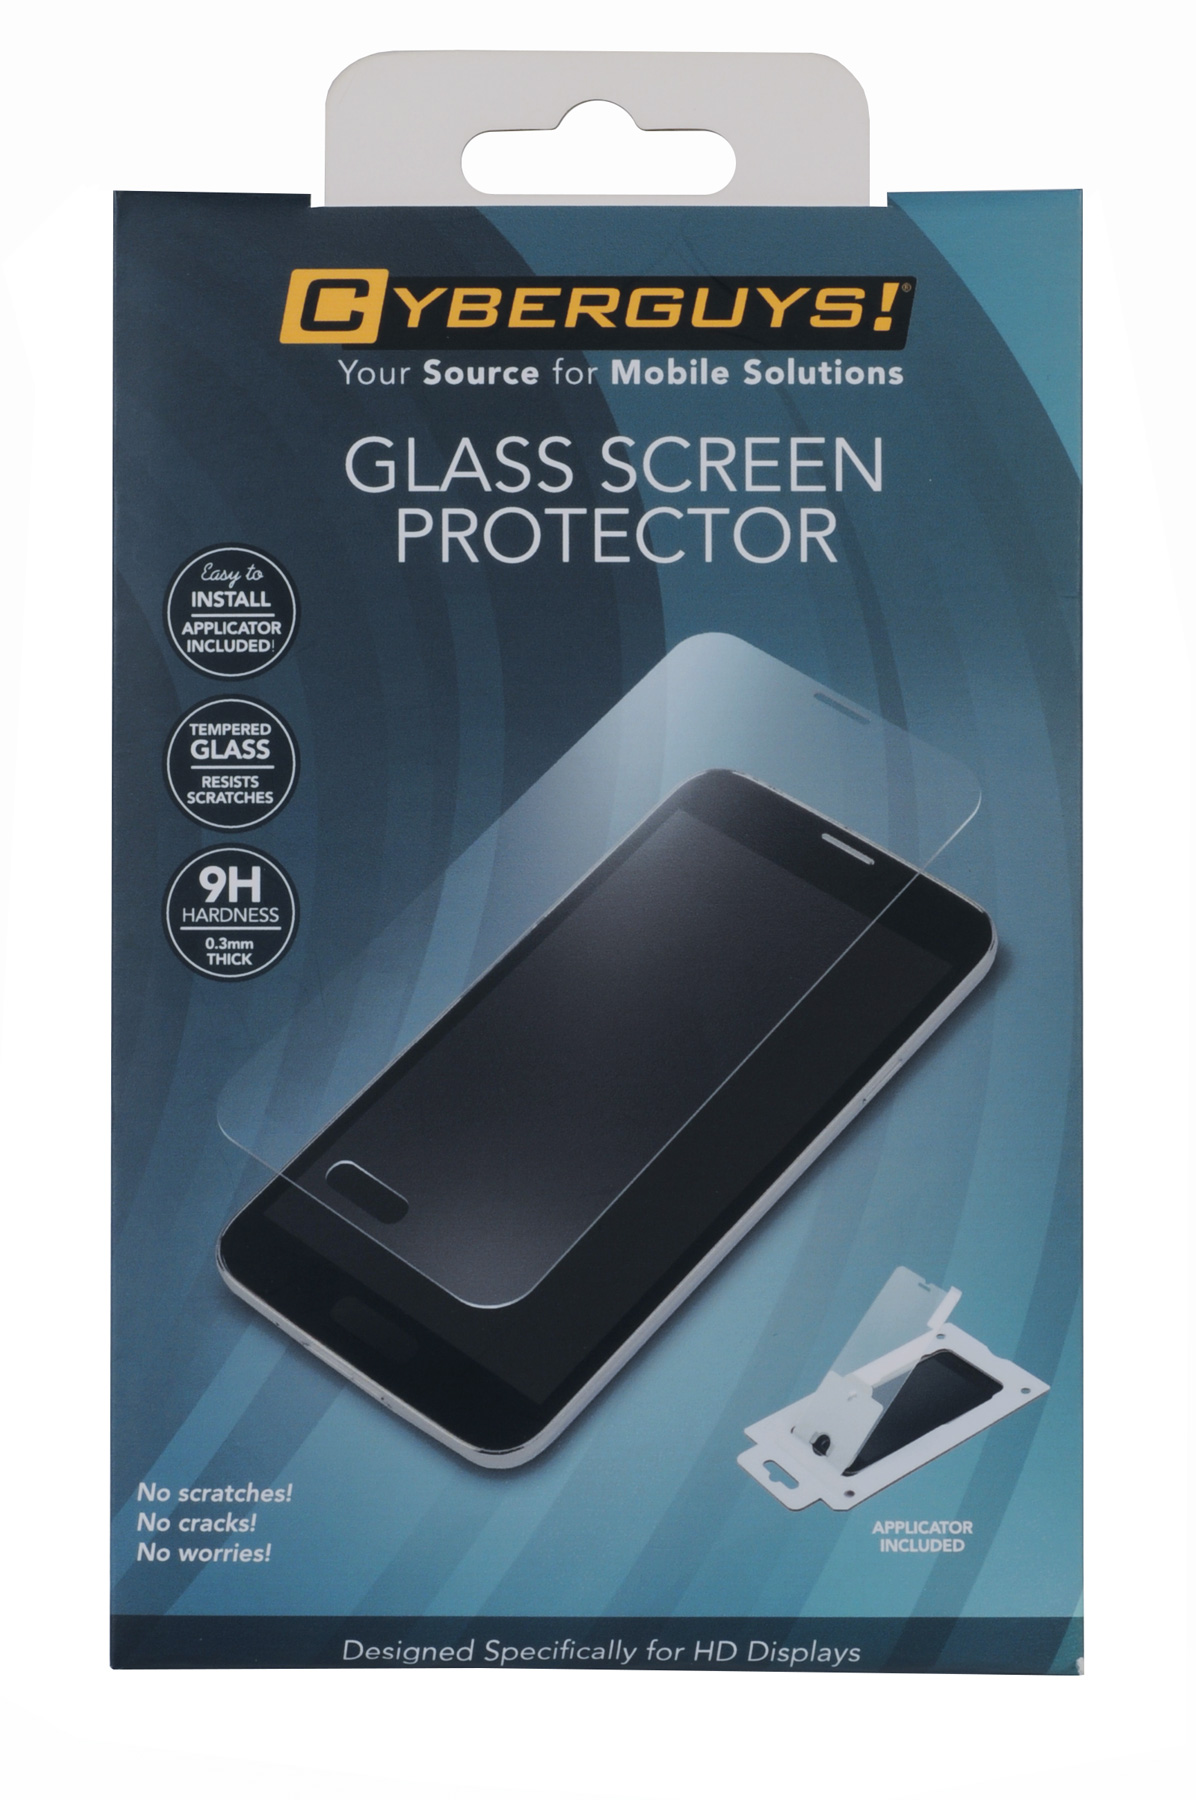 Package design for Cyberguys! © E-filliate Inc.